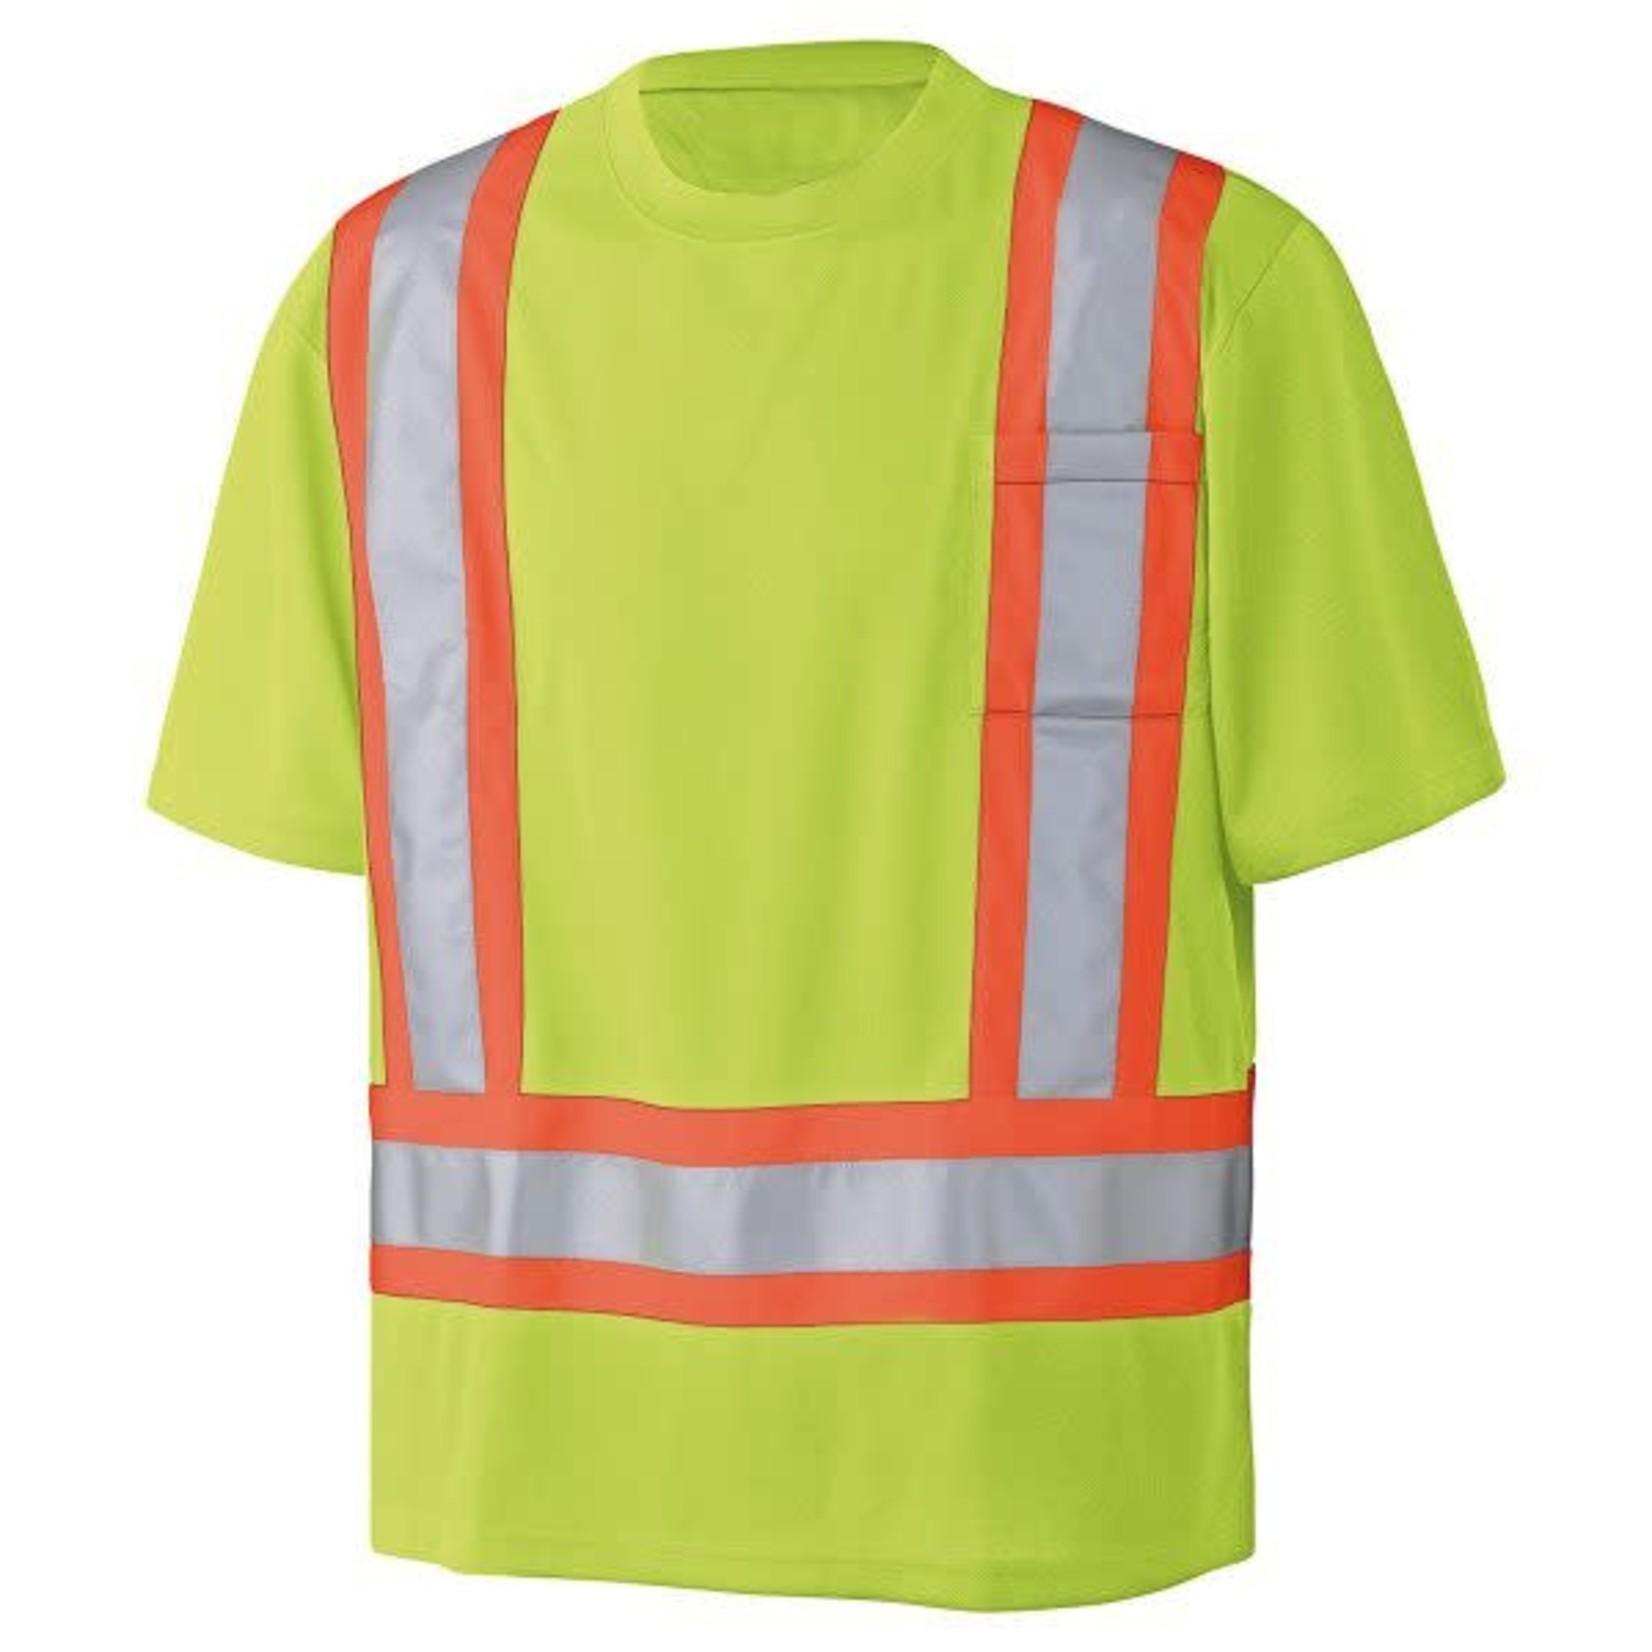 Pioneer Pioneer Shirt Short Sleeve Hi-Vis Moisture Wicking Birdseye Yellow